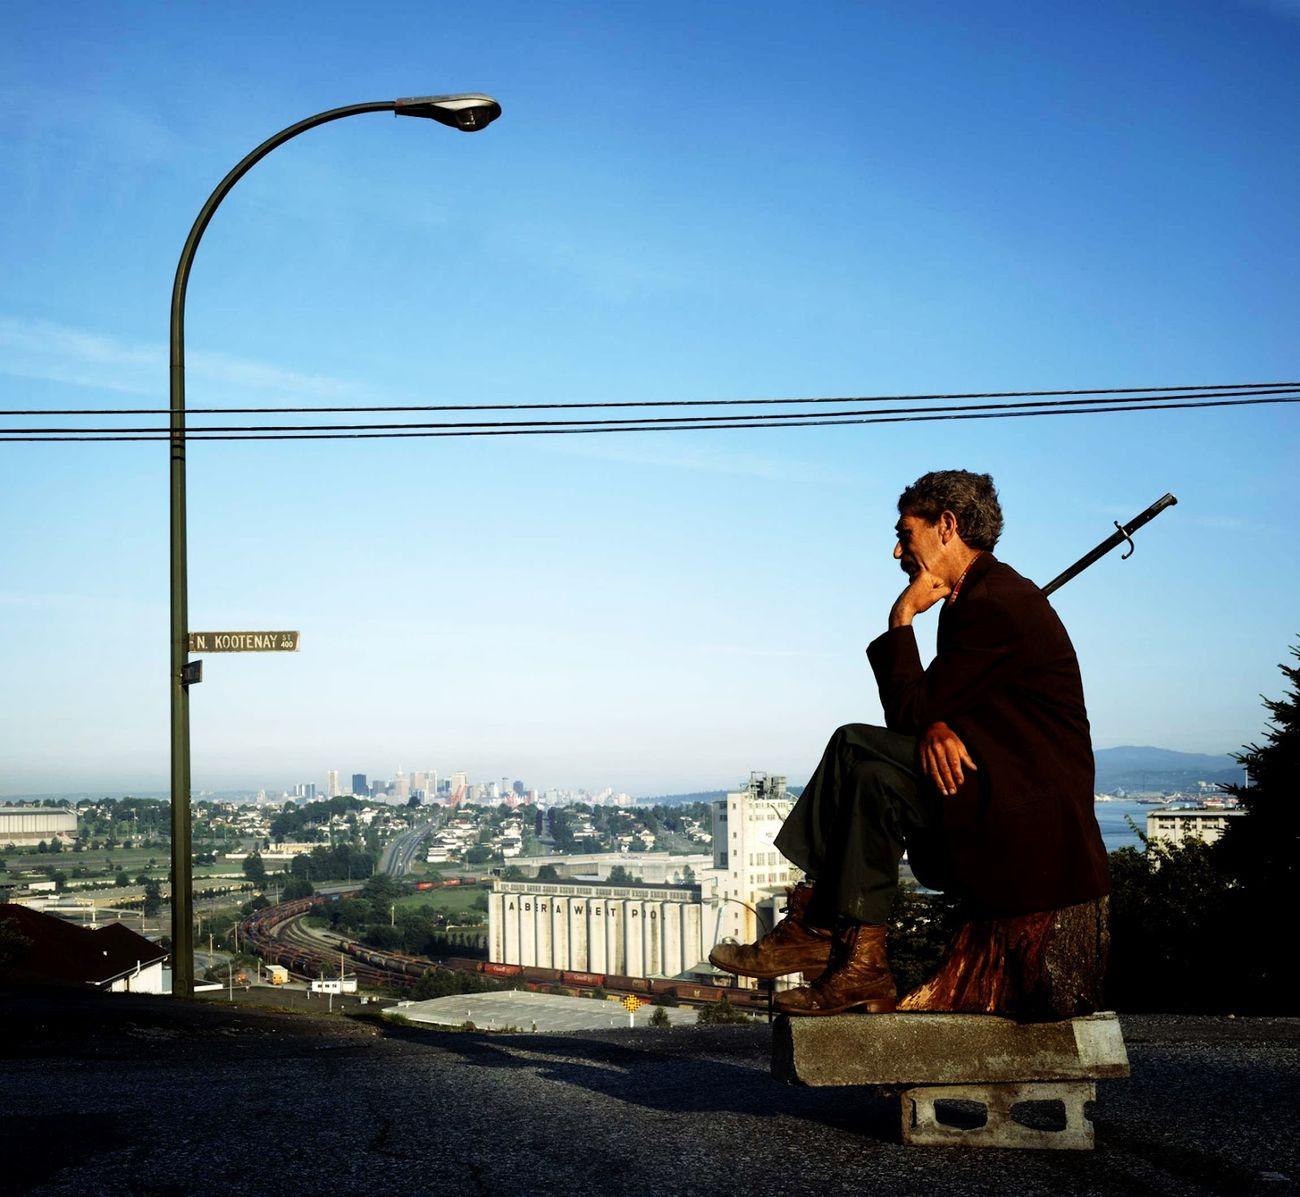 Jeff Wall, The Thinker, 1986